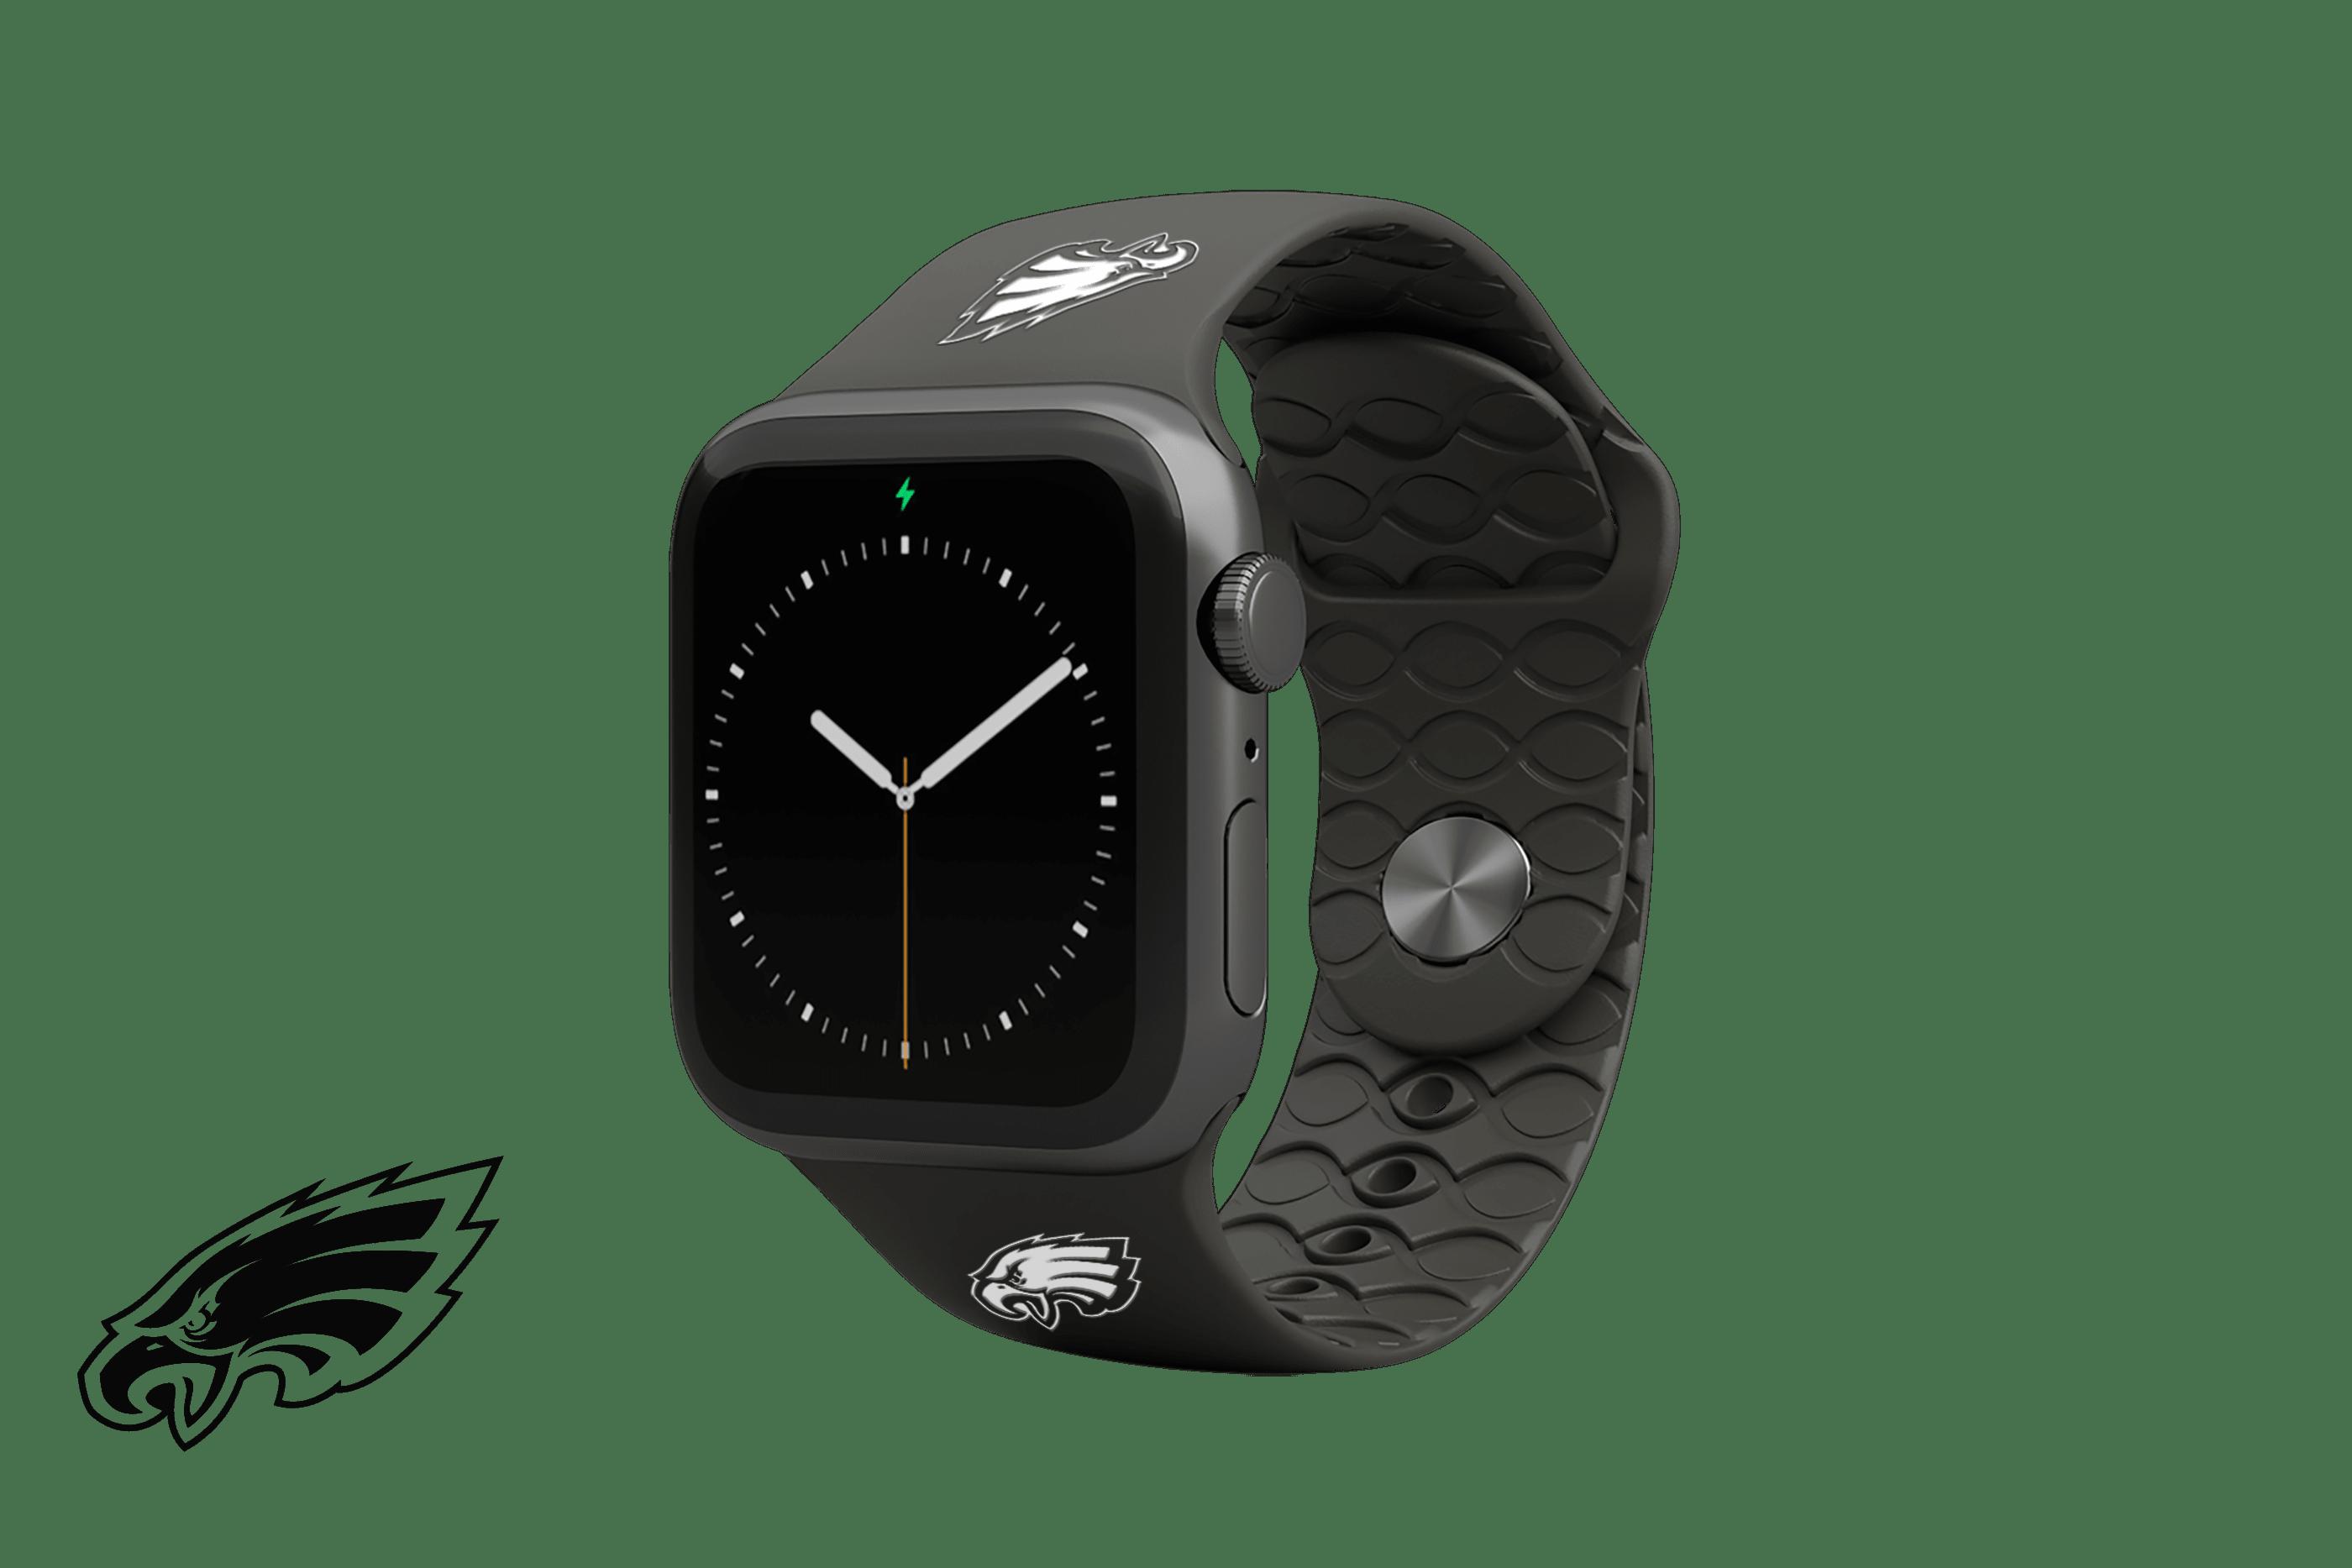 Apple Watch Band NFL Philadelphia Eagles Black - Groove Life